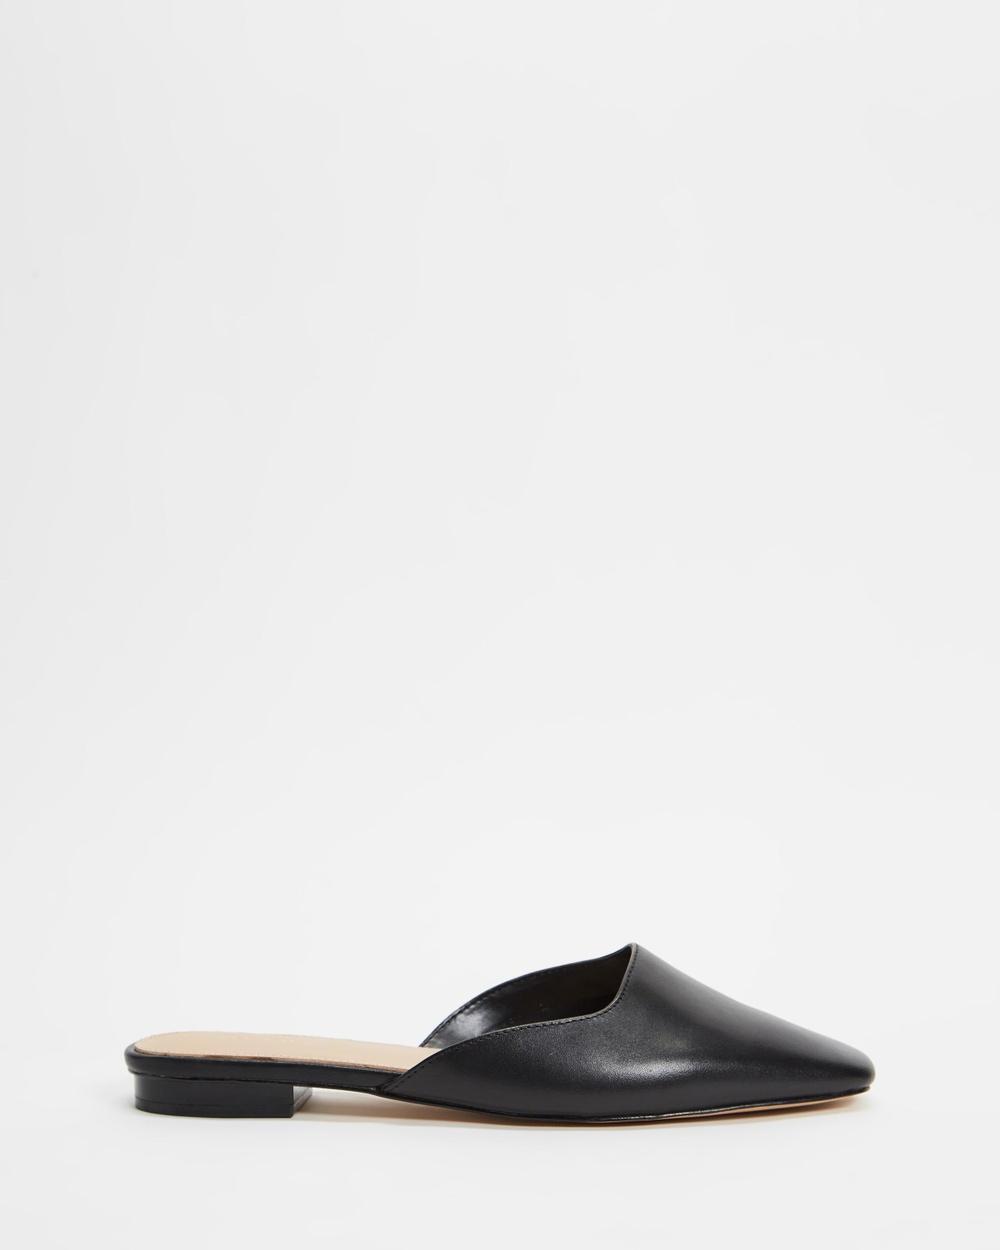 ALDO Alyssaa Pointed Toe Mules Flats Black